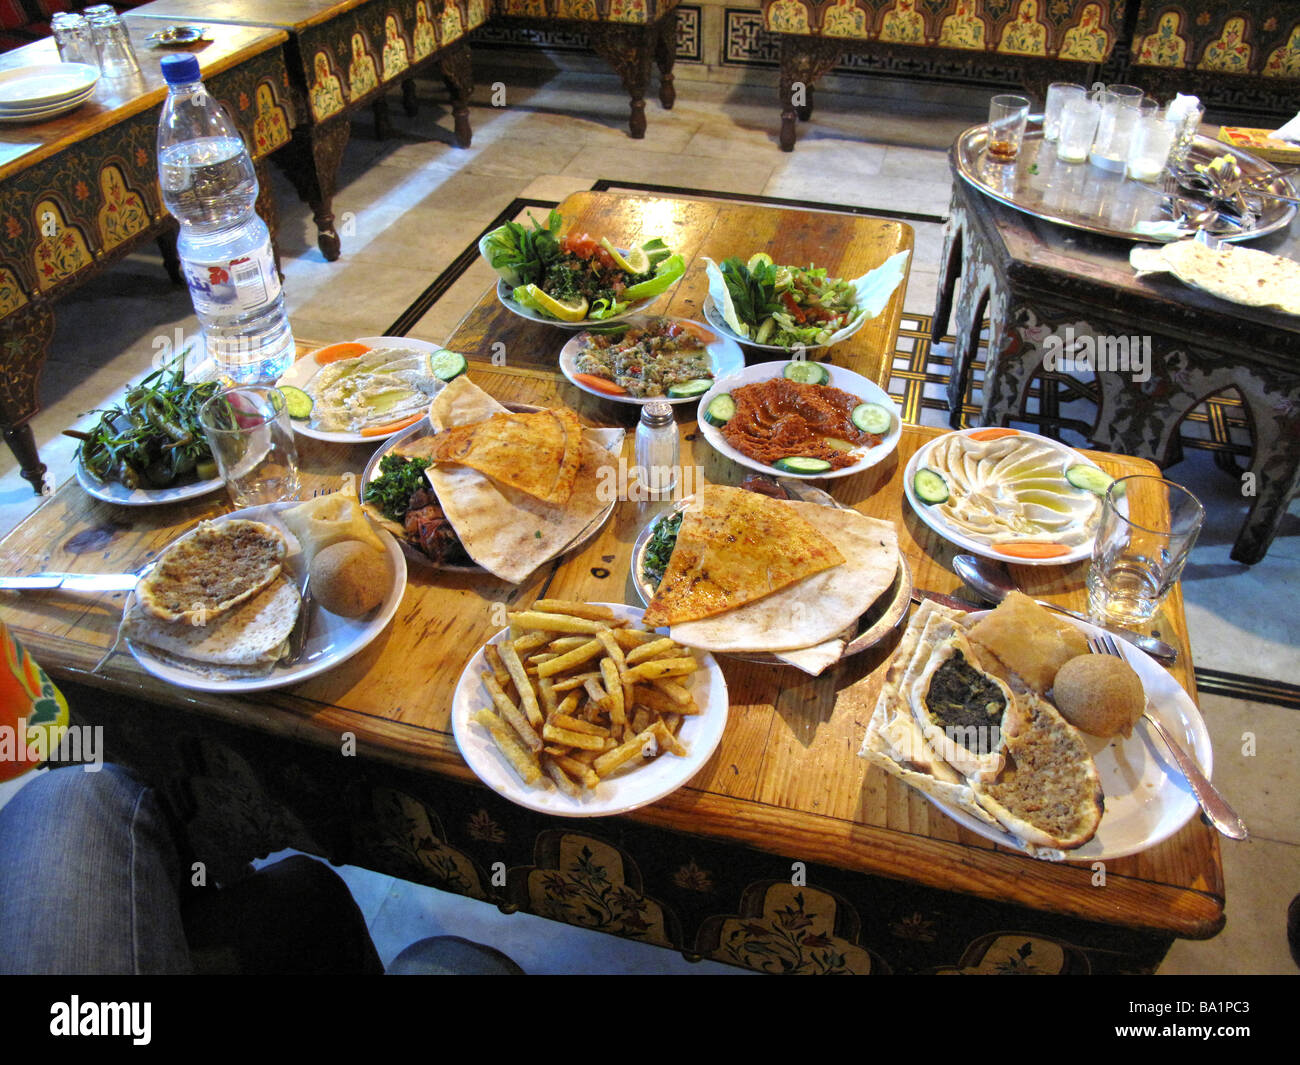 In PHOTOS: Eid Mubarak - Rediff.com News  |Damascus Food